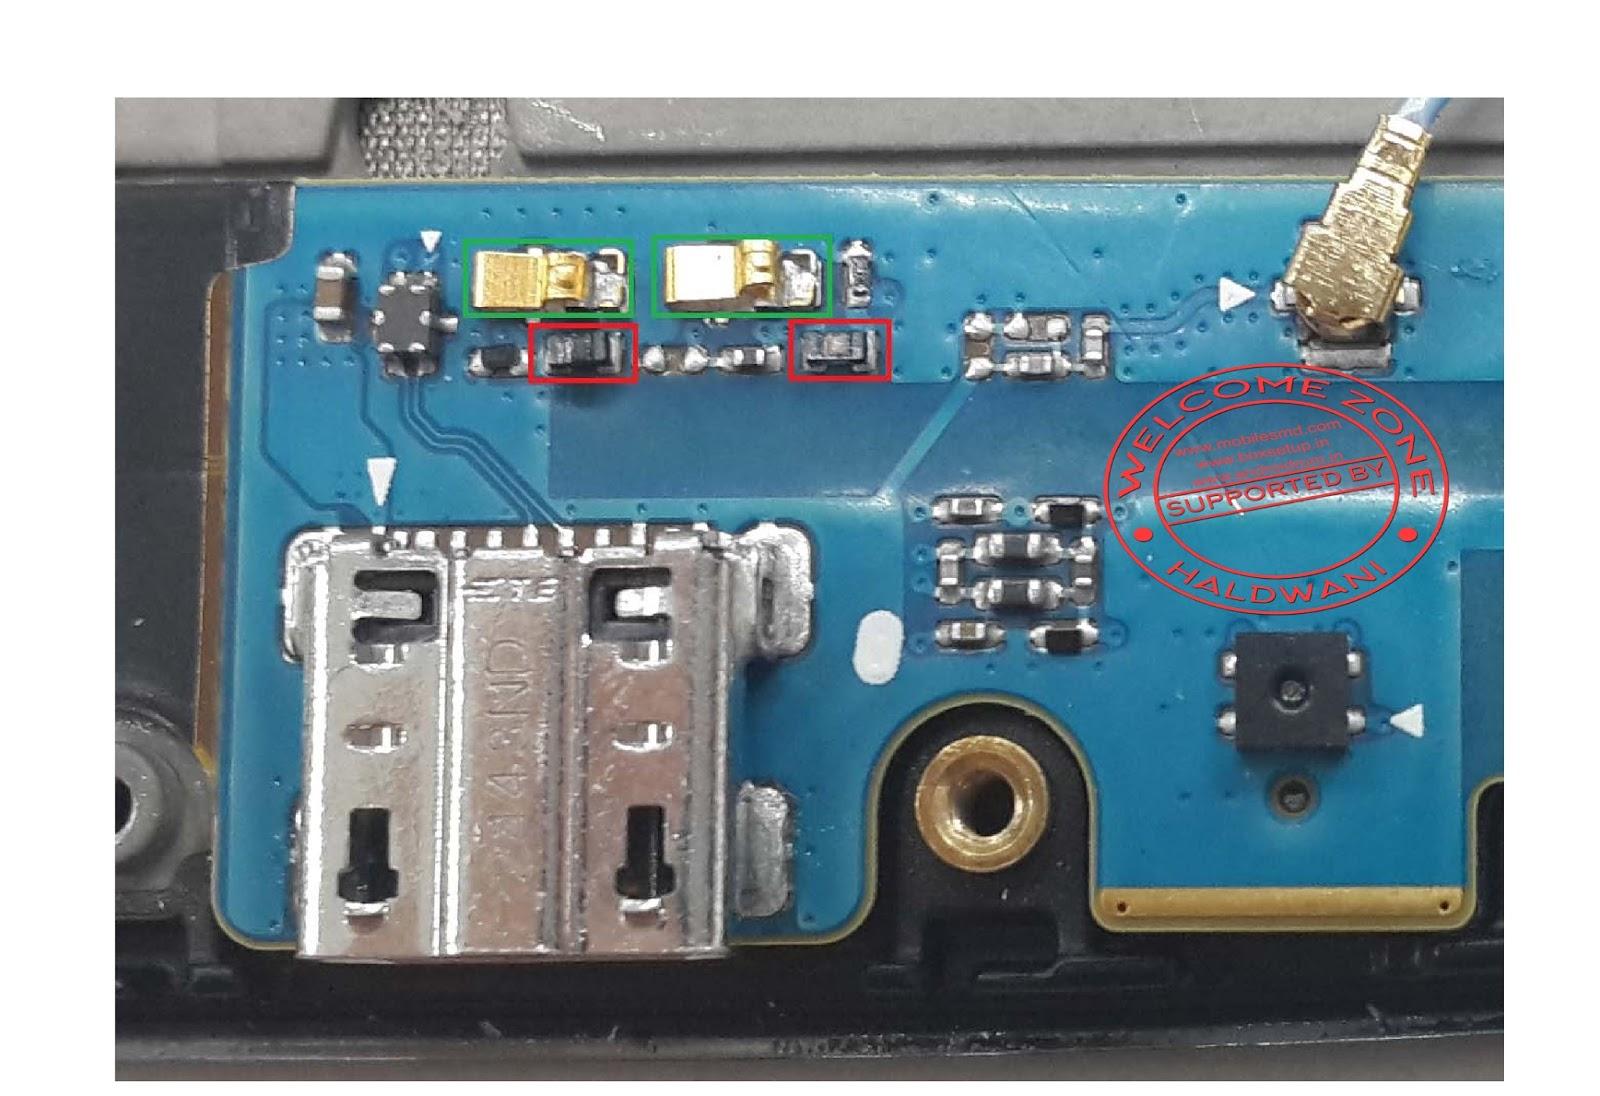 Samsung Galaxy S4 I9500 Ringer Speaker Part Not Working Solution